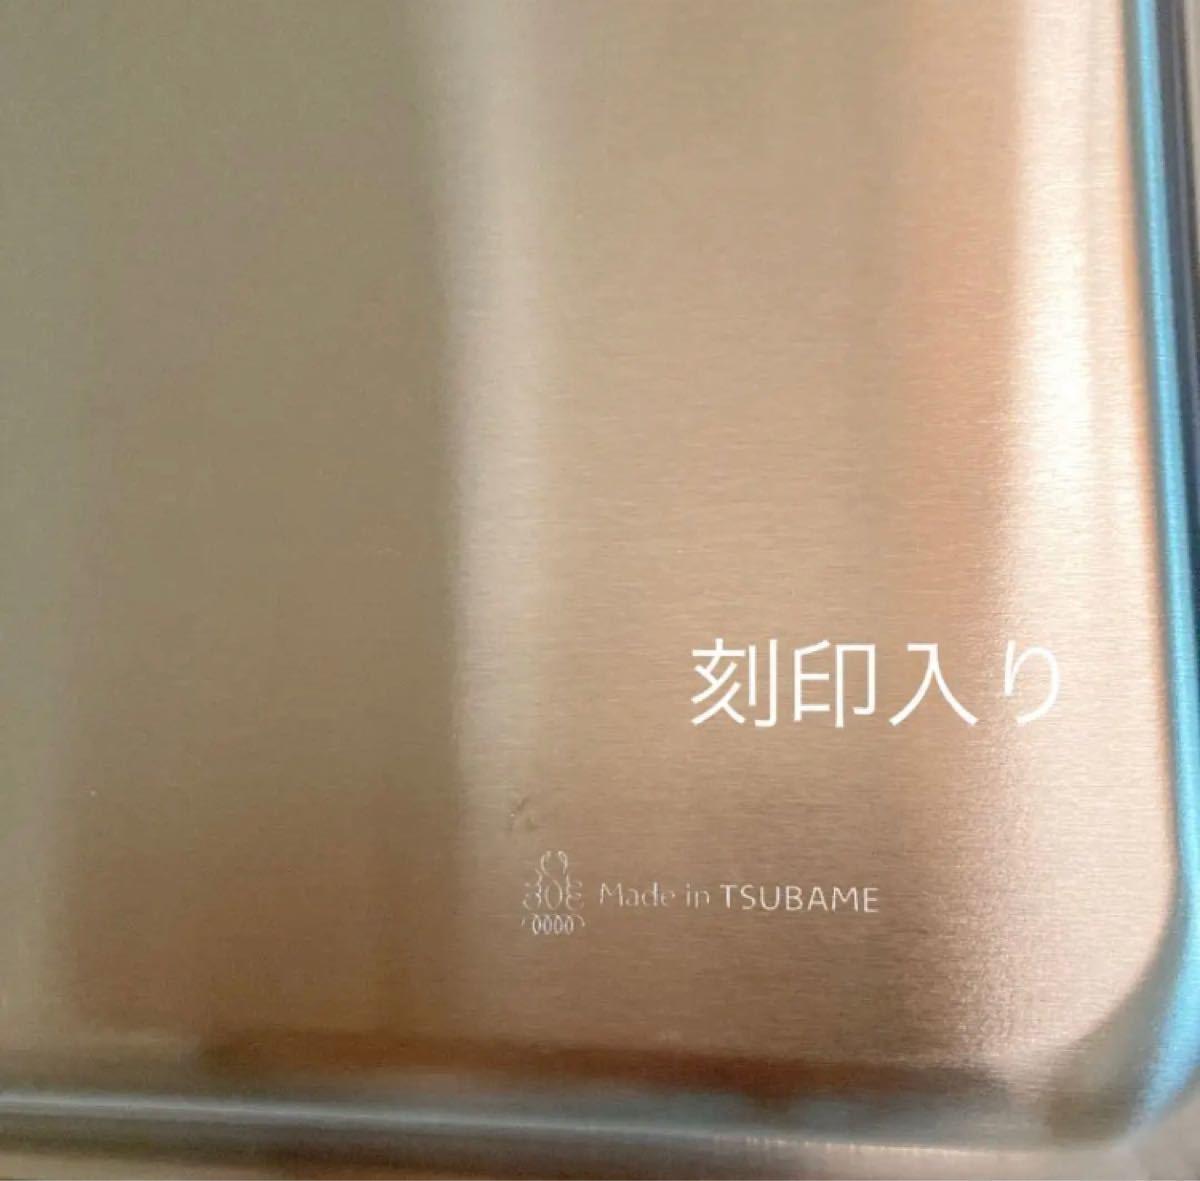 MADE in TSUBAME深型バットと網付きバットセット 新品 日本製 新潟県燕市燕三条 刻印入り ステンレスバット